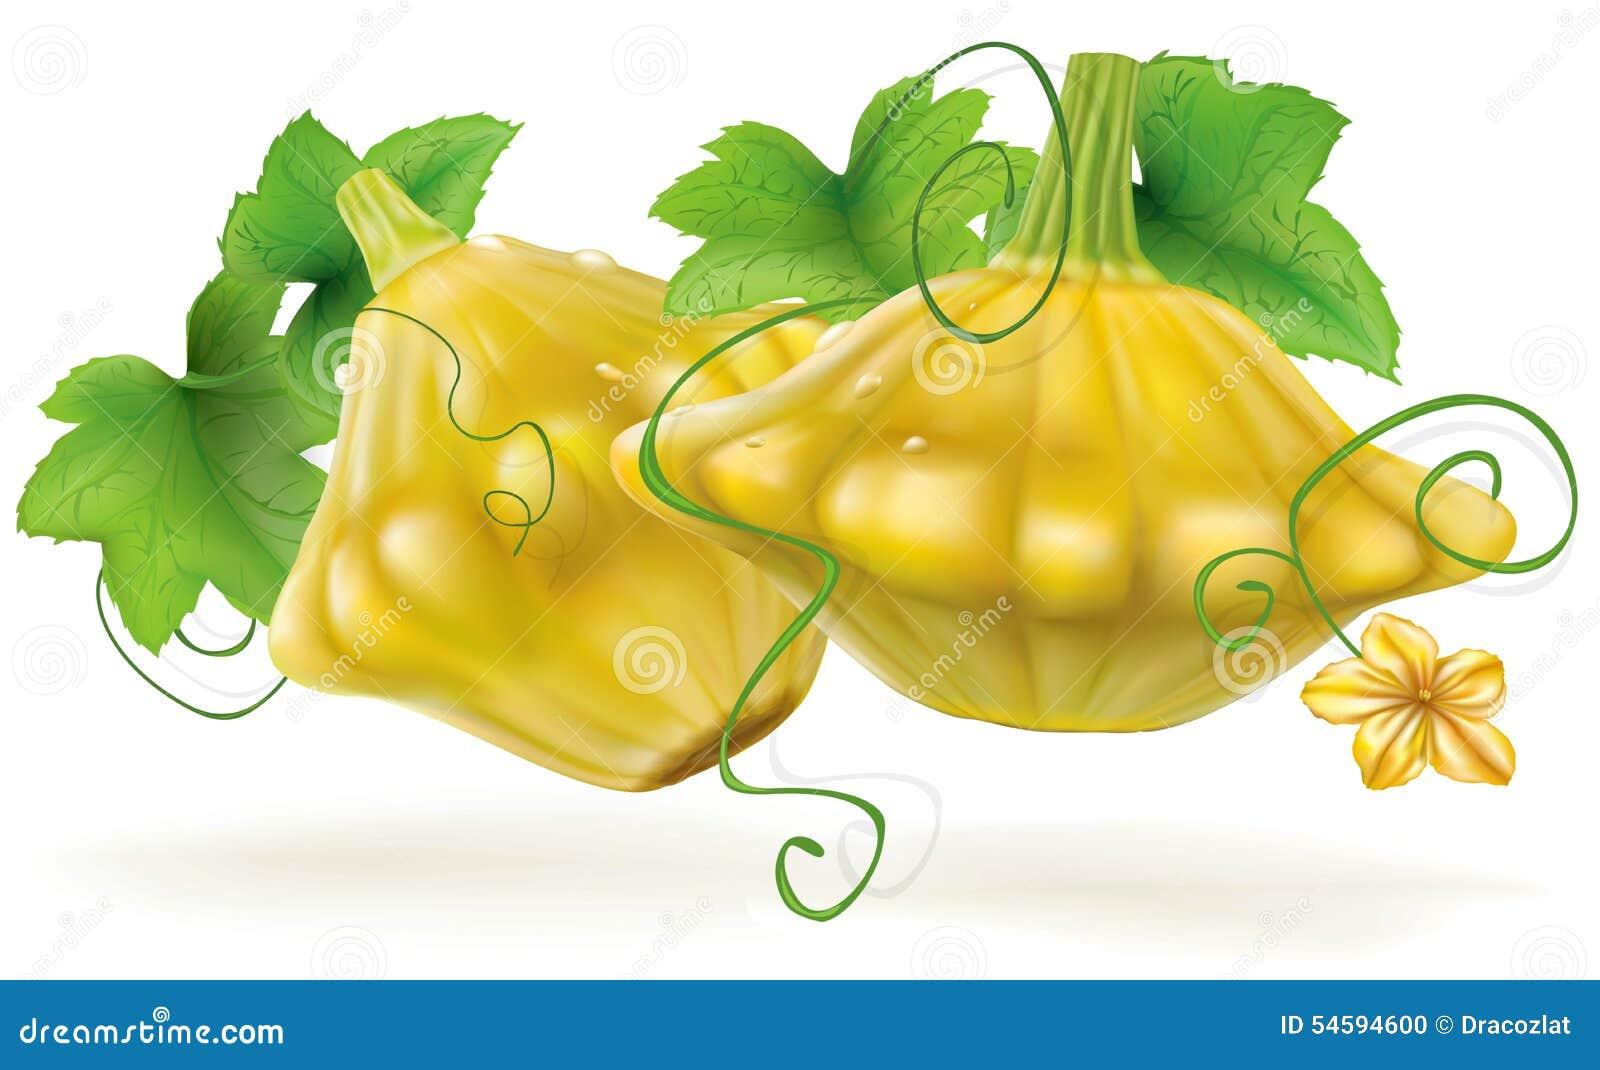 Line Drawing Zucchini : Cucurbitaceae cartoons illustrations vector stock